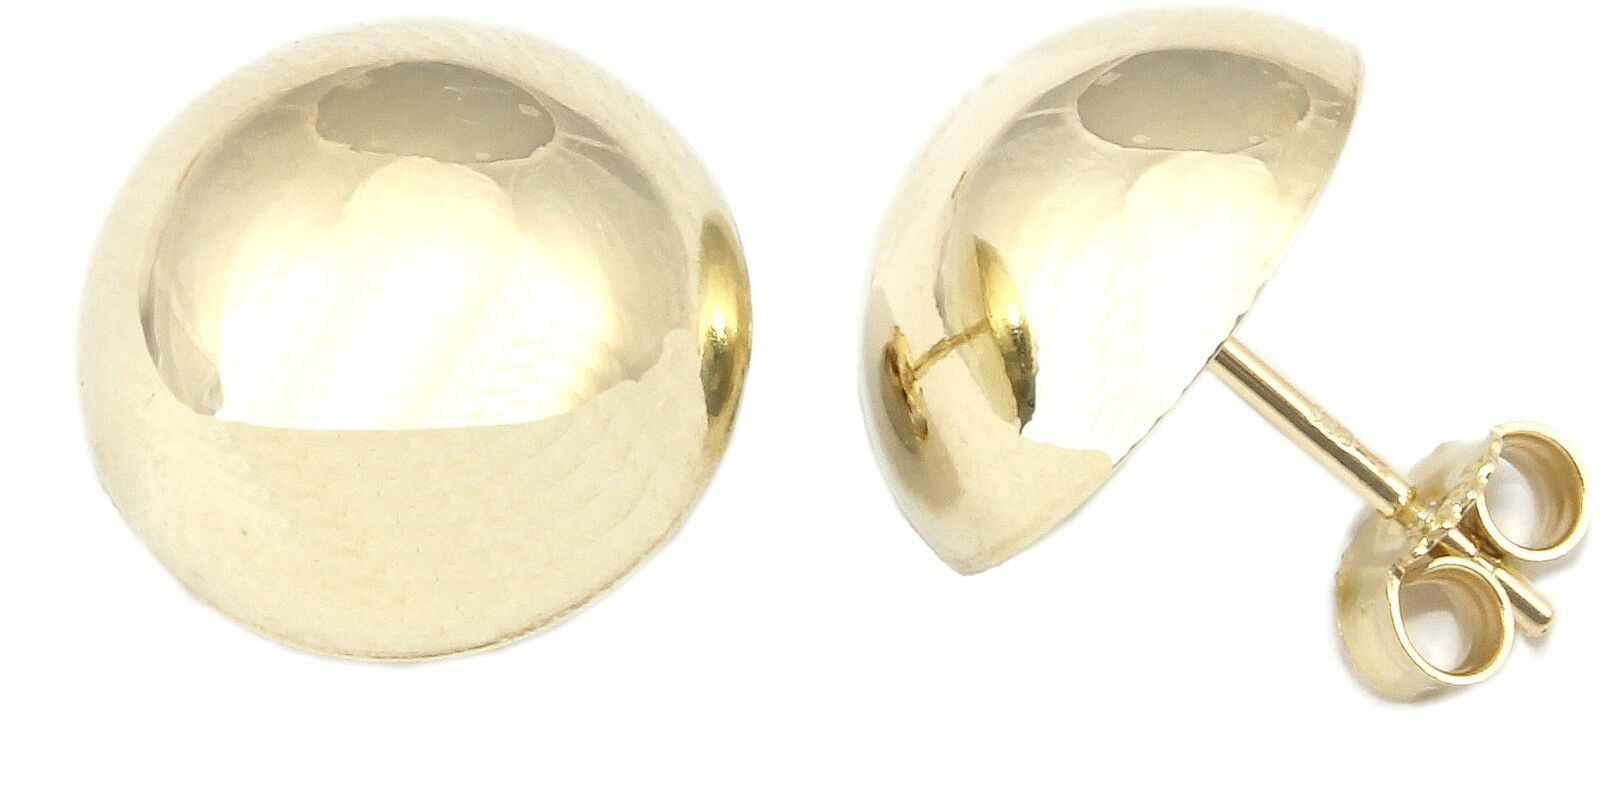 Damen Ohrringe Ohrstecker echt Gold 585 Halbkugel 12 mm Stecker Kugel Gelbgold